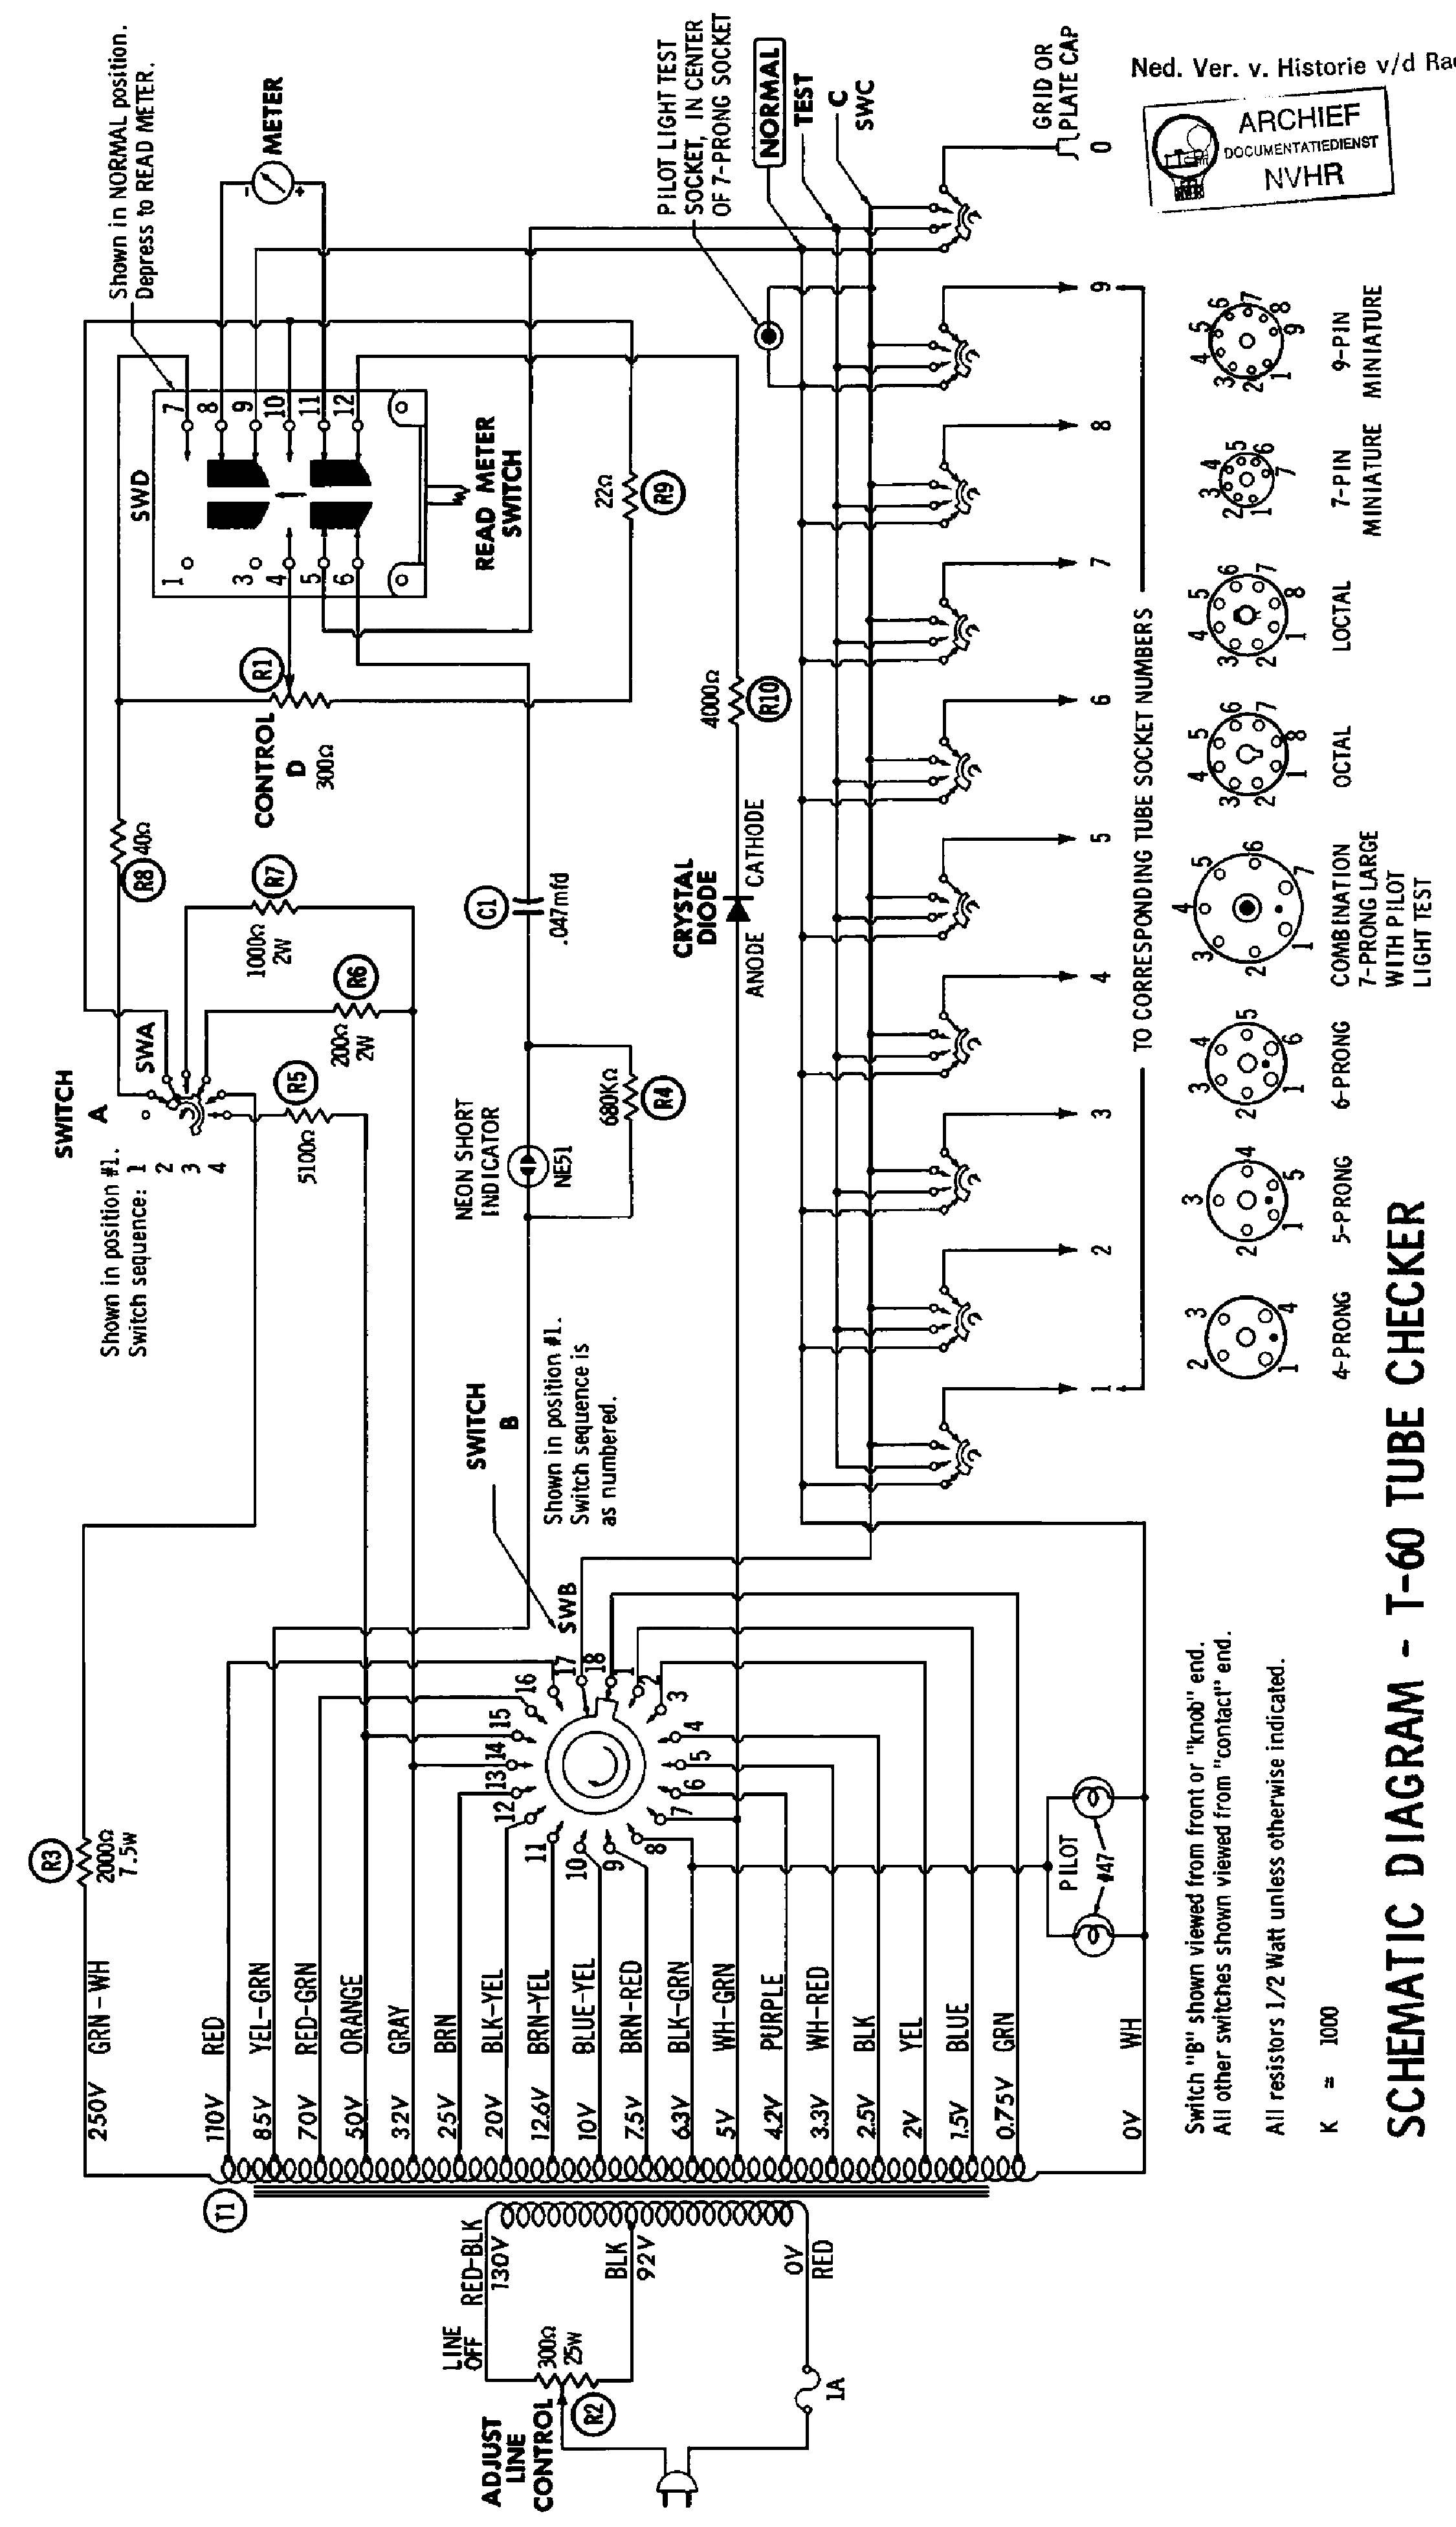 paco t60 tube checker schematic service manual free